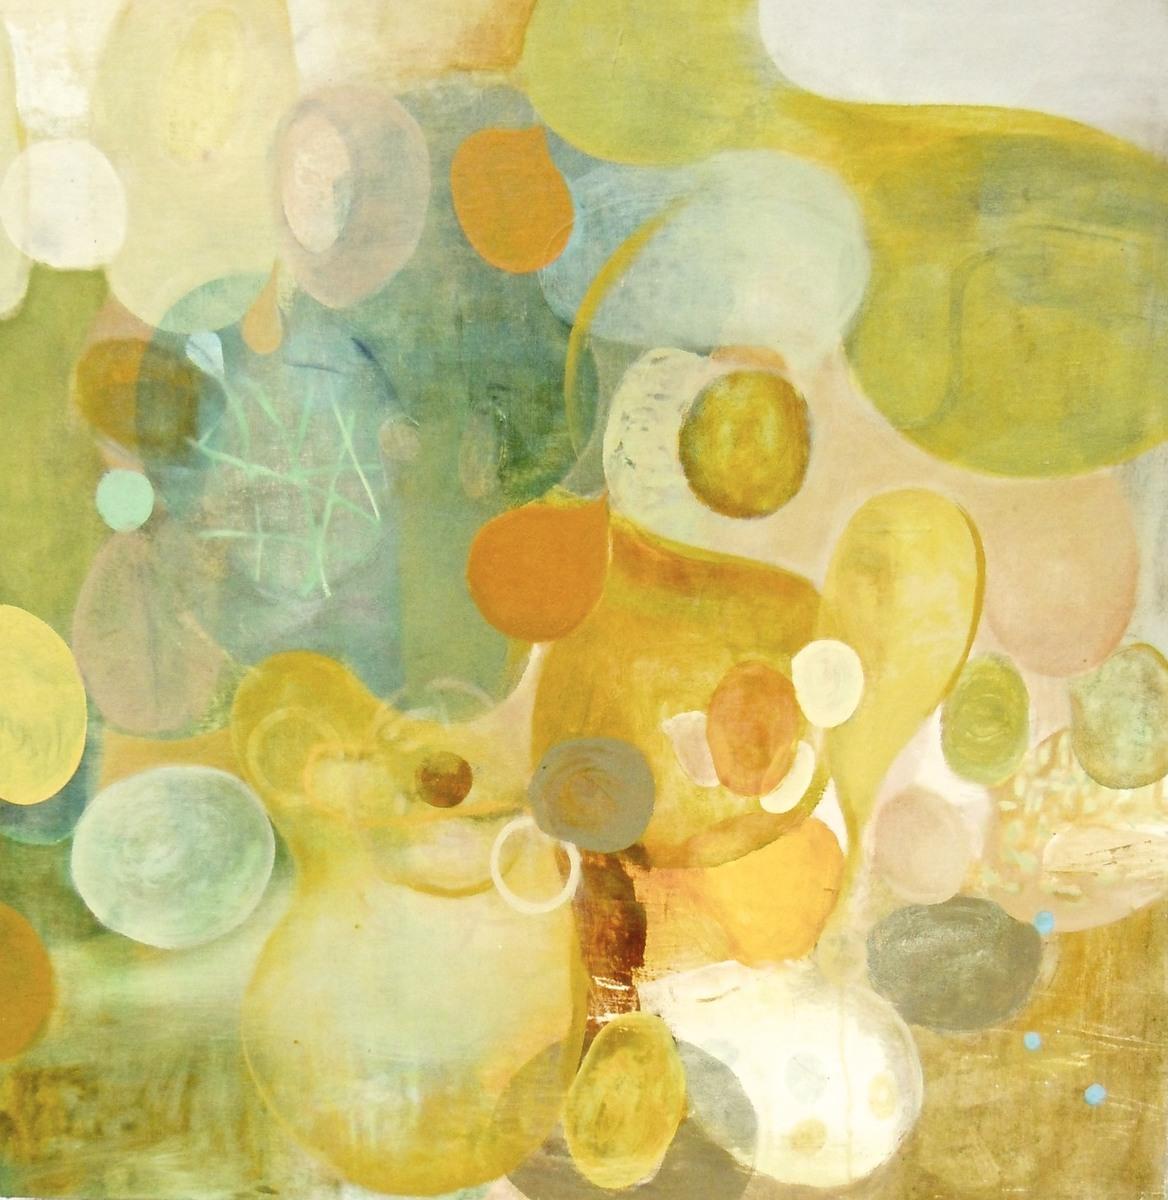 "Nine Heavans, 36"" x 36"", Oil on Canvas on Panel, 2002, copyright victoriajohnson.net"